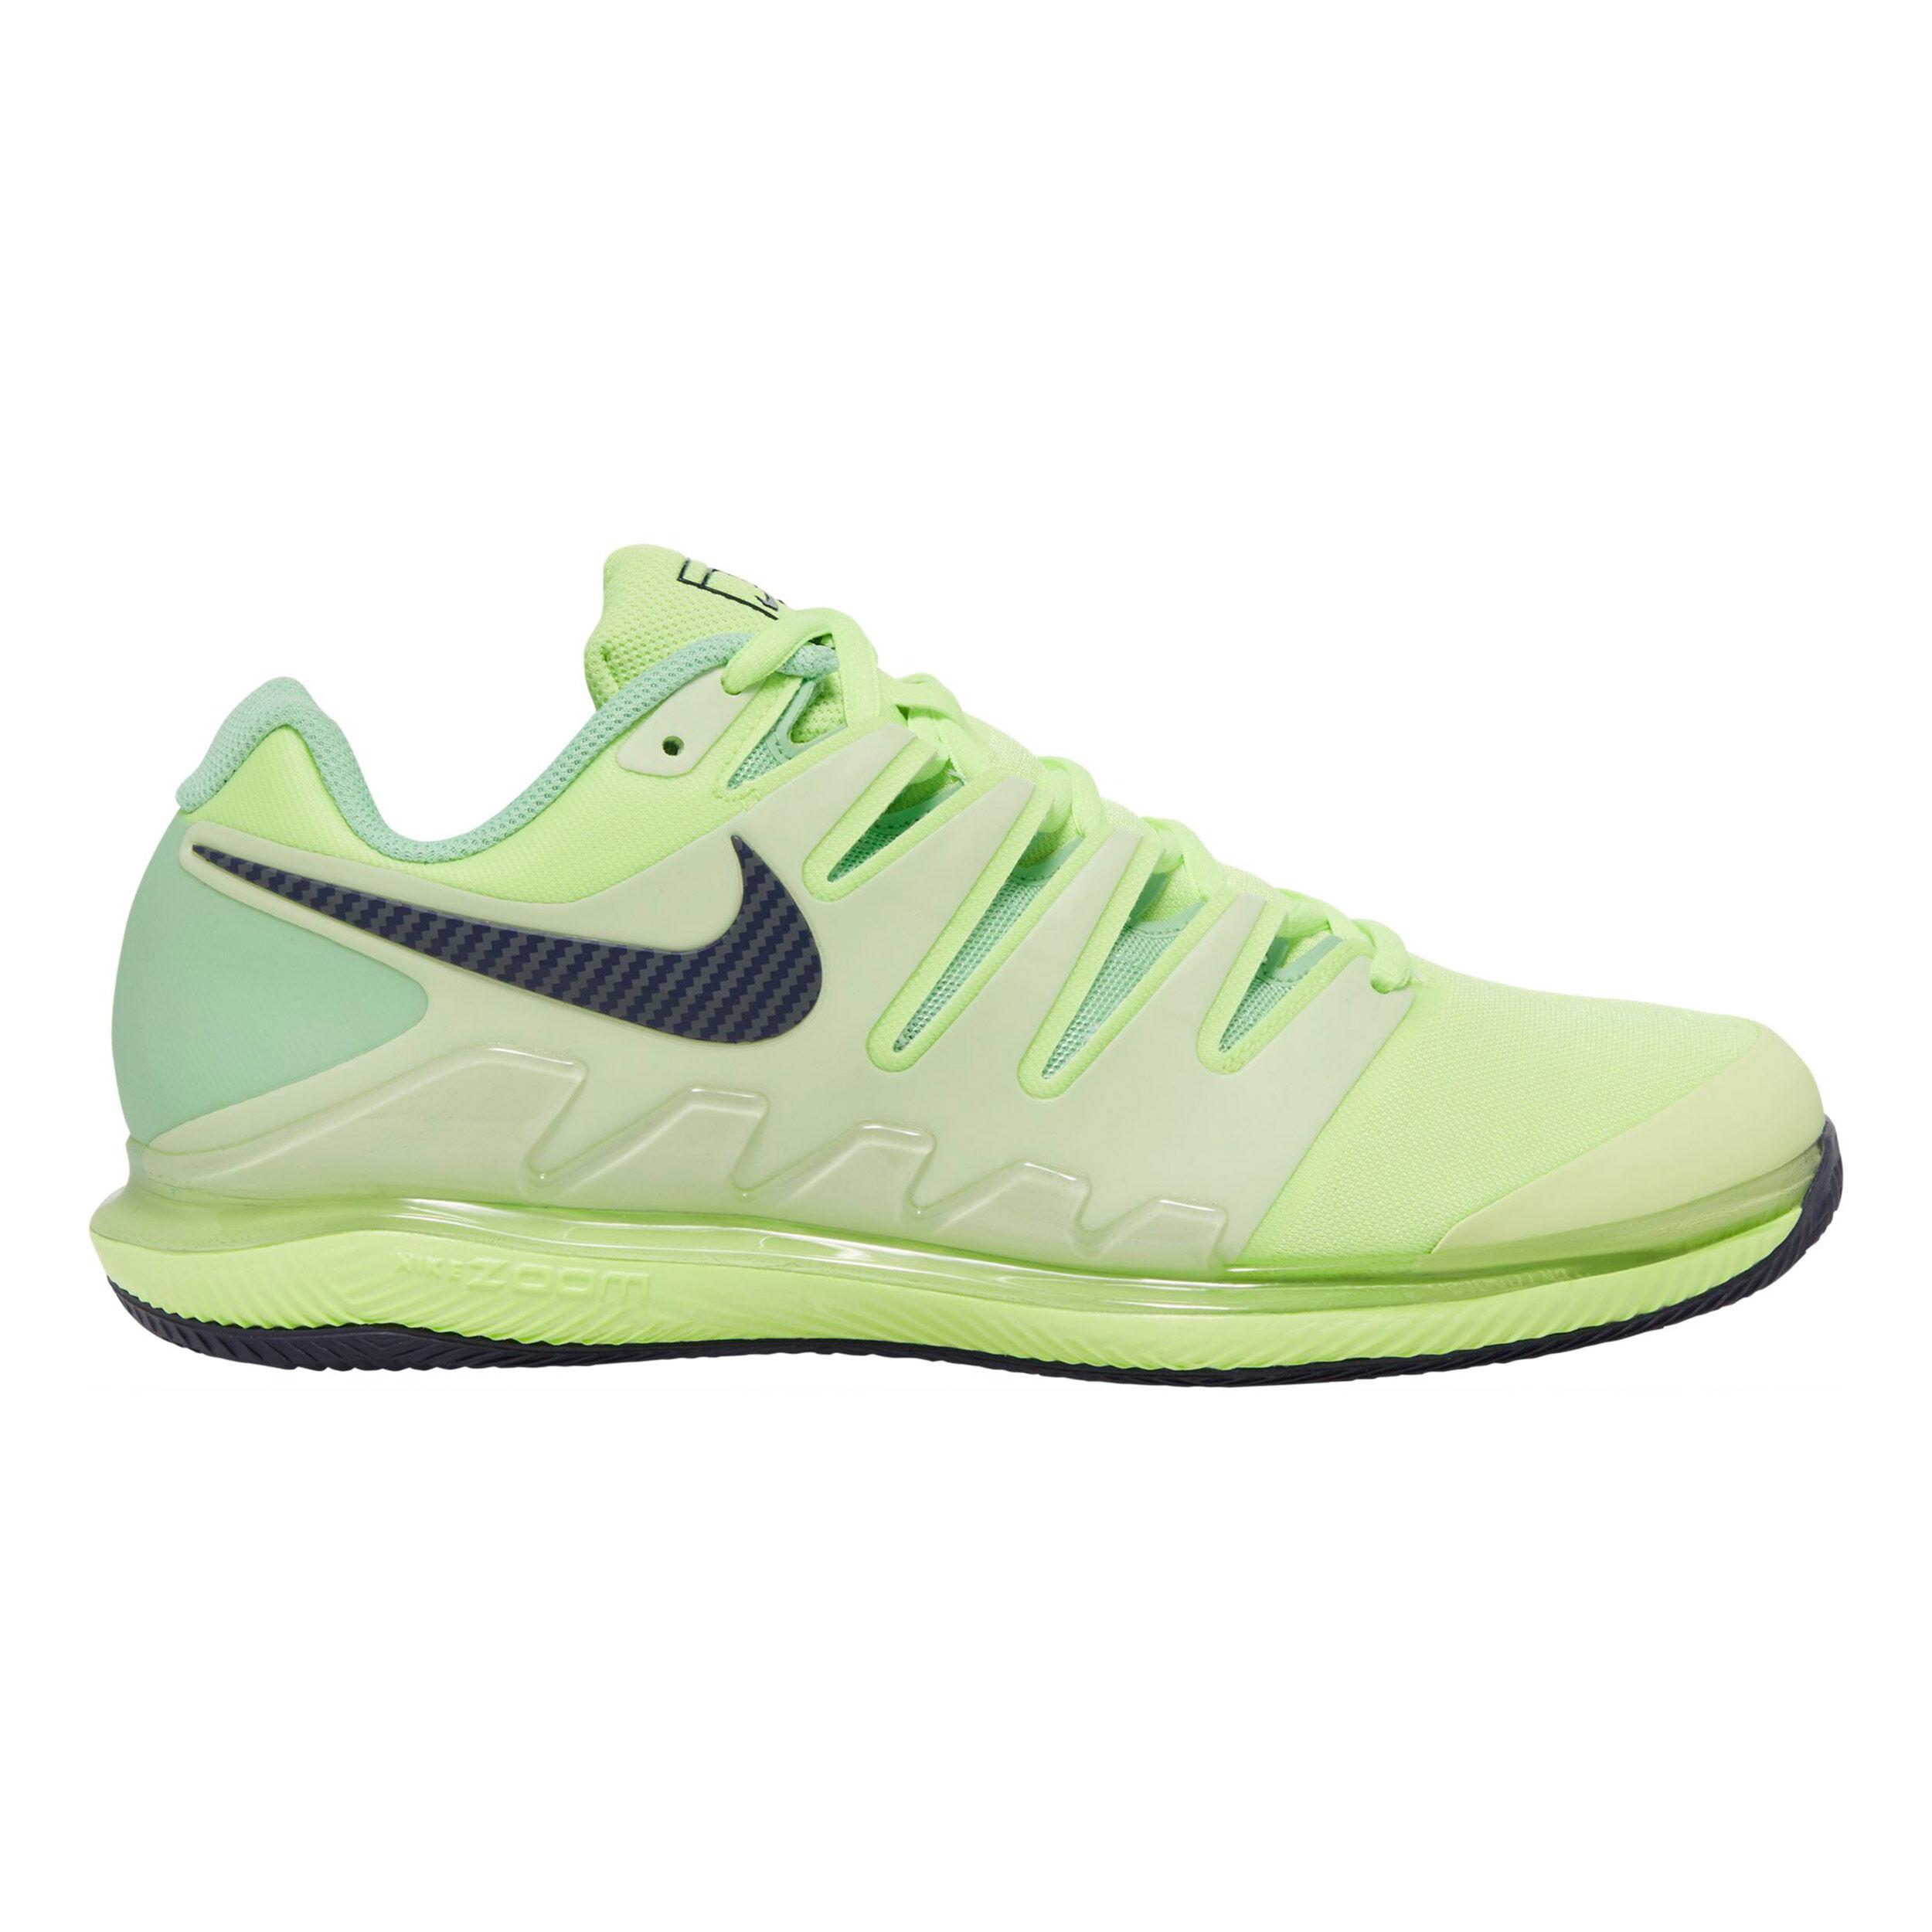 Nike Air Zoom Vapor X Clay Chaussure Terre Battue Hommes - Vert ...